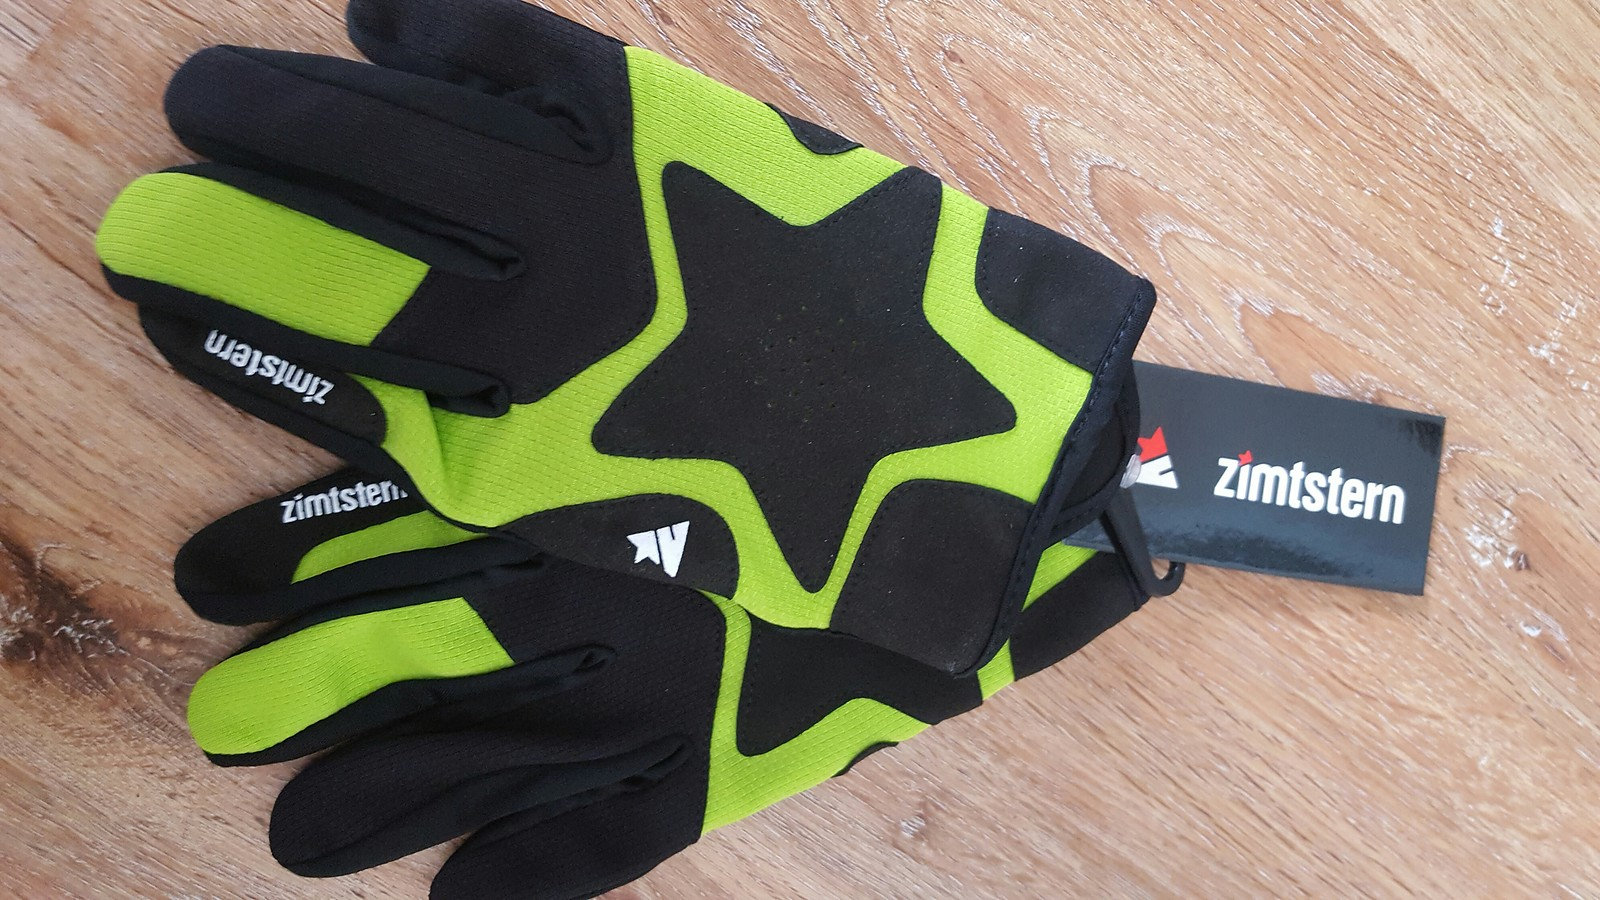 zimtstern draco pro glove handschuhe farbe lime neu gr e l bikemarkt mtb. Black Bedroom Furniture Sets. Home Design Ideas